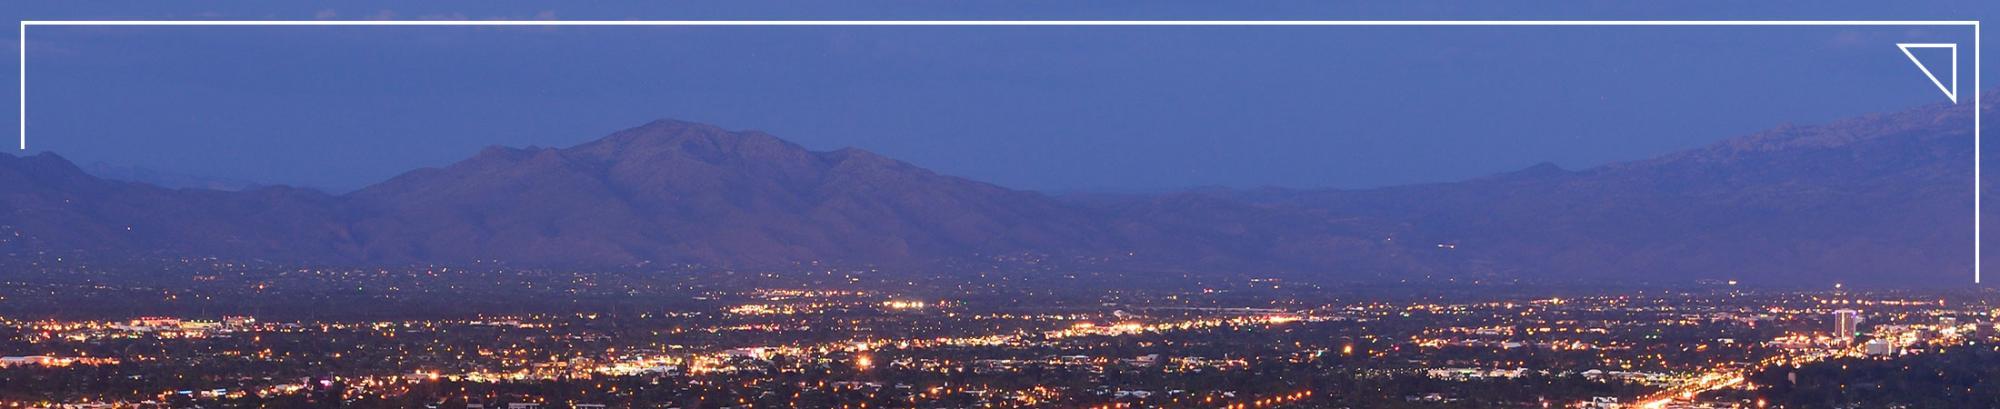 desert city at night in Arizona Mexico borderlands